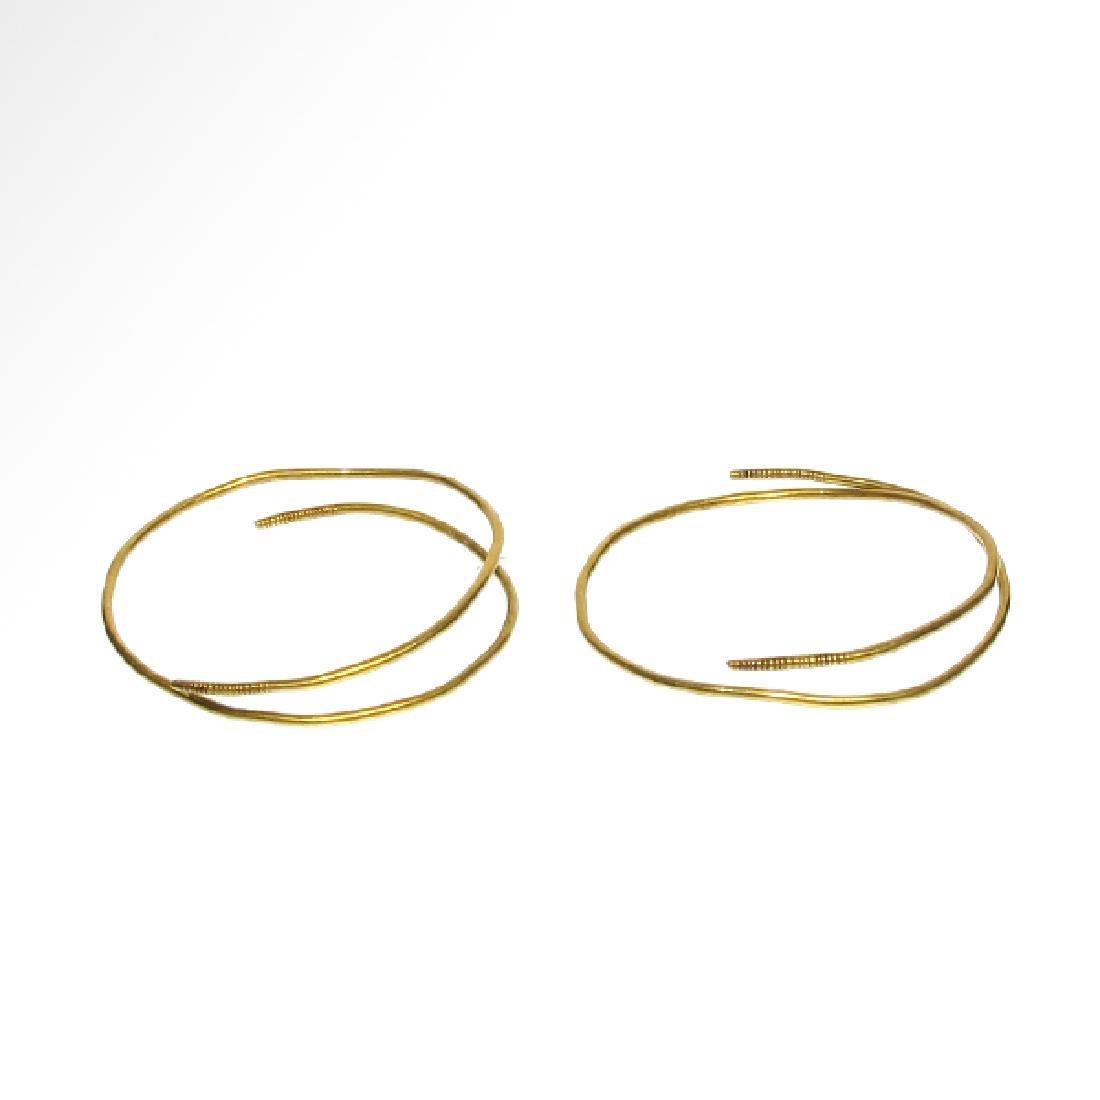 Viking pair of Gold Hoop Earrings 9th-10th Century A.D.